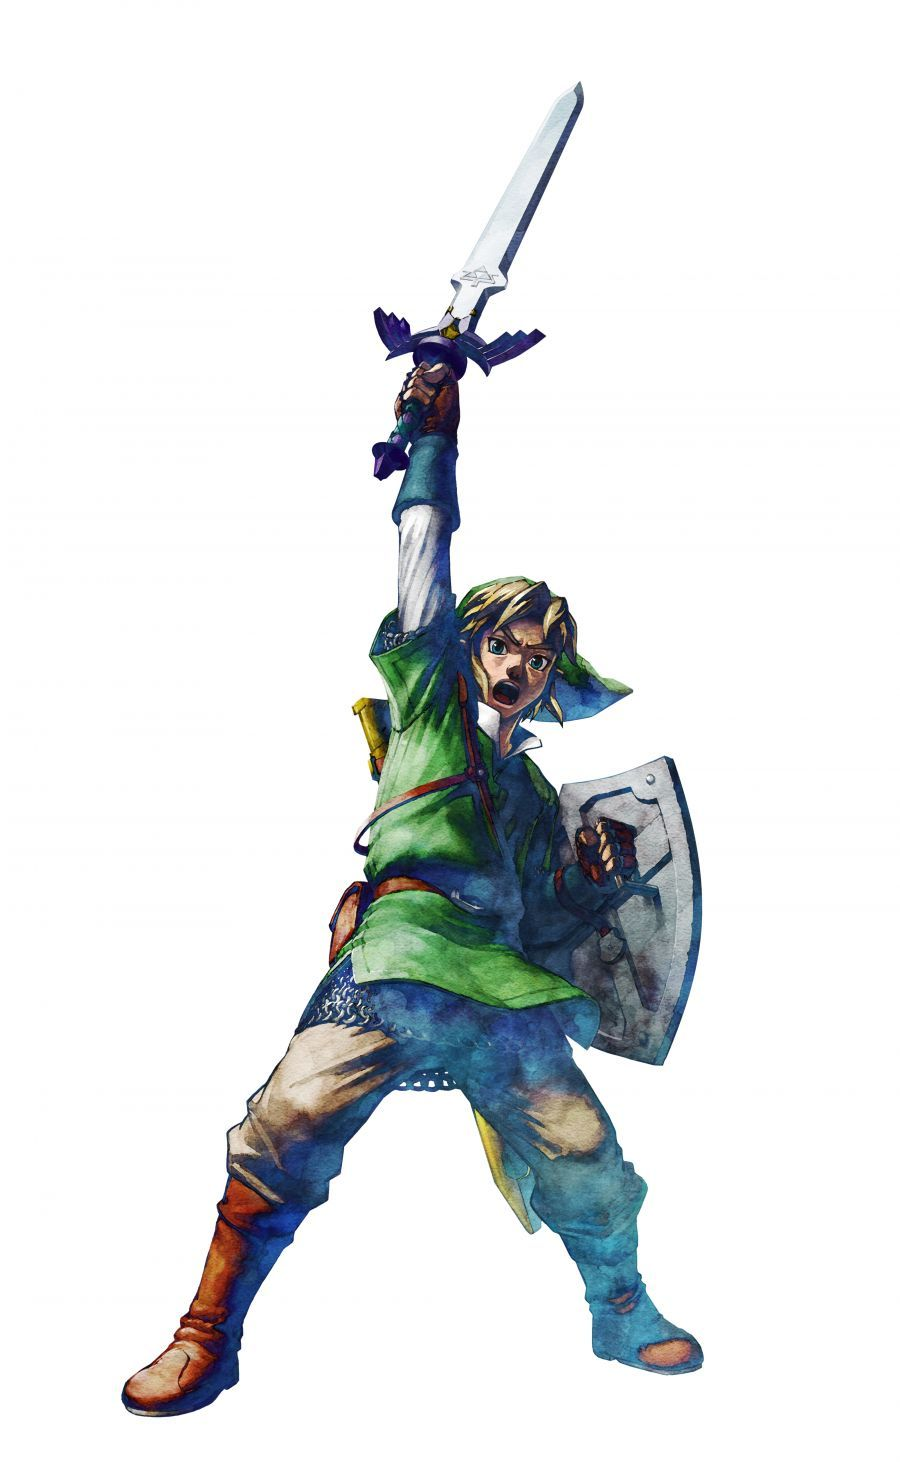 Link Skyward Sword Official Artwork